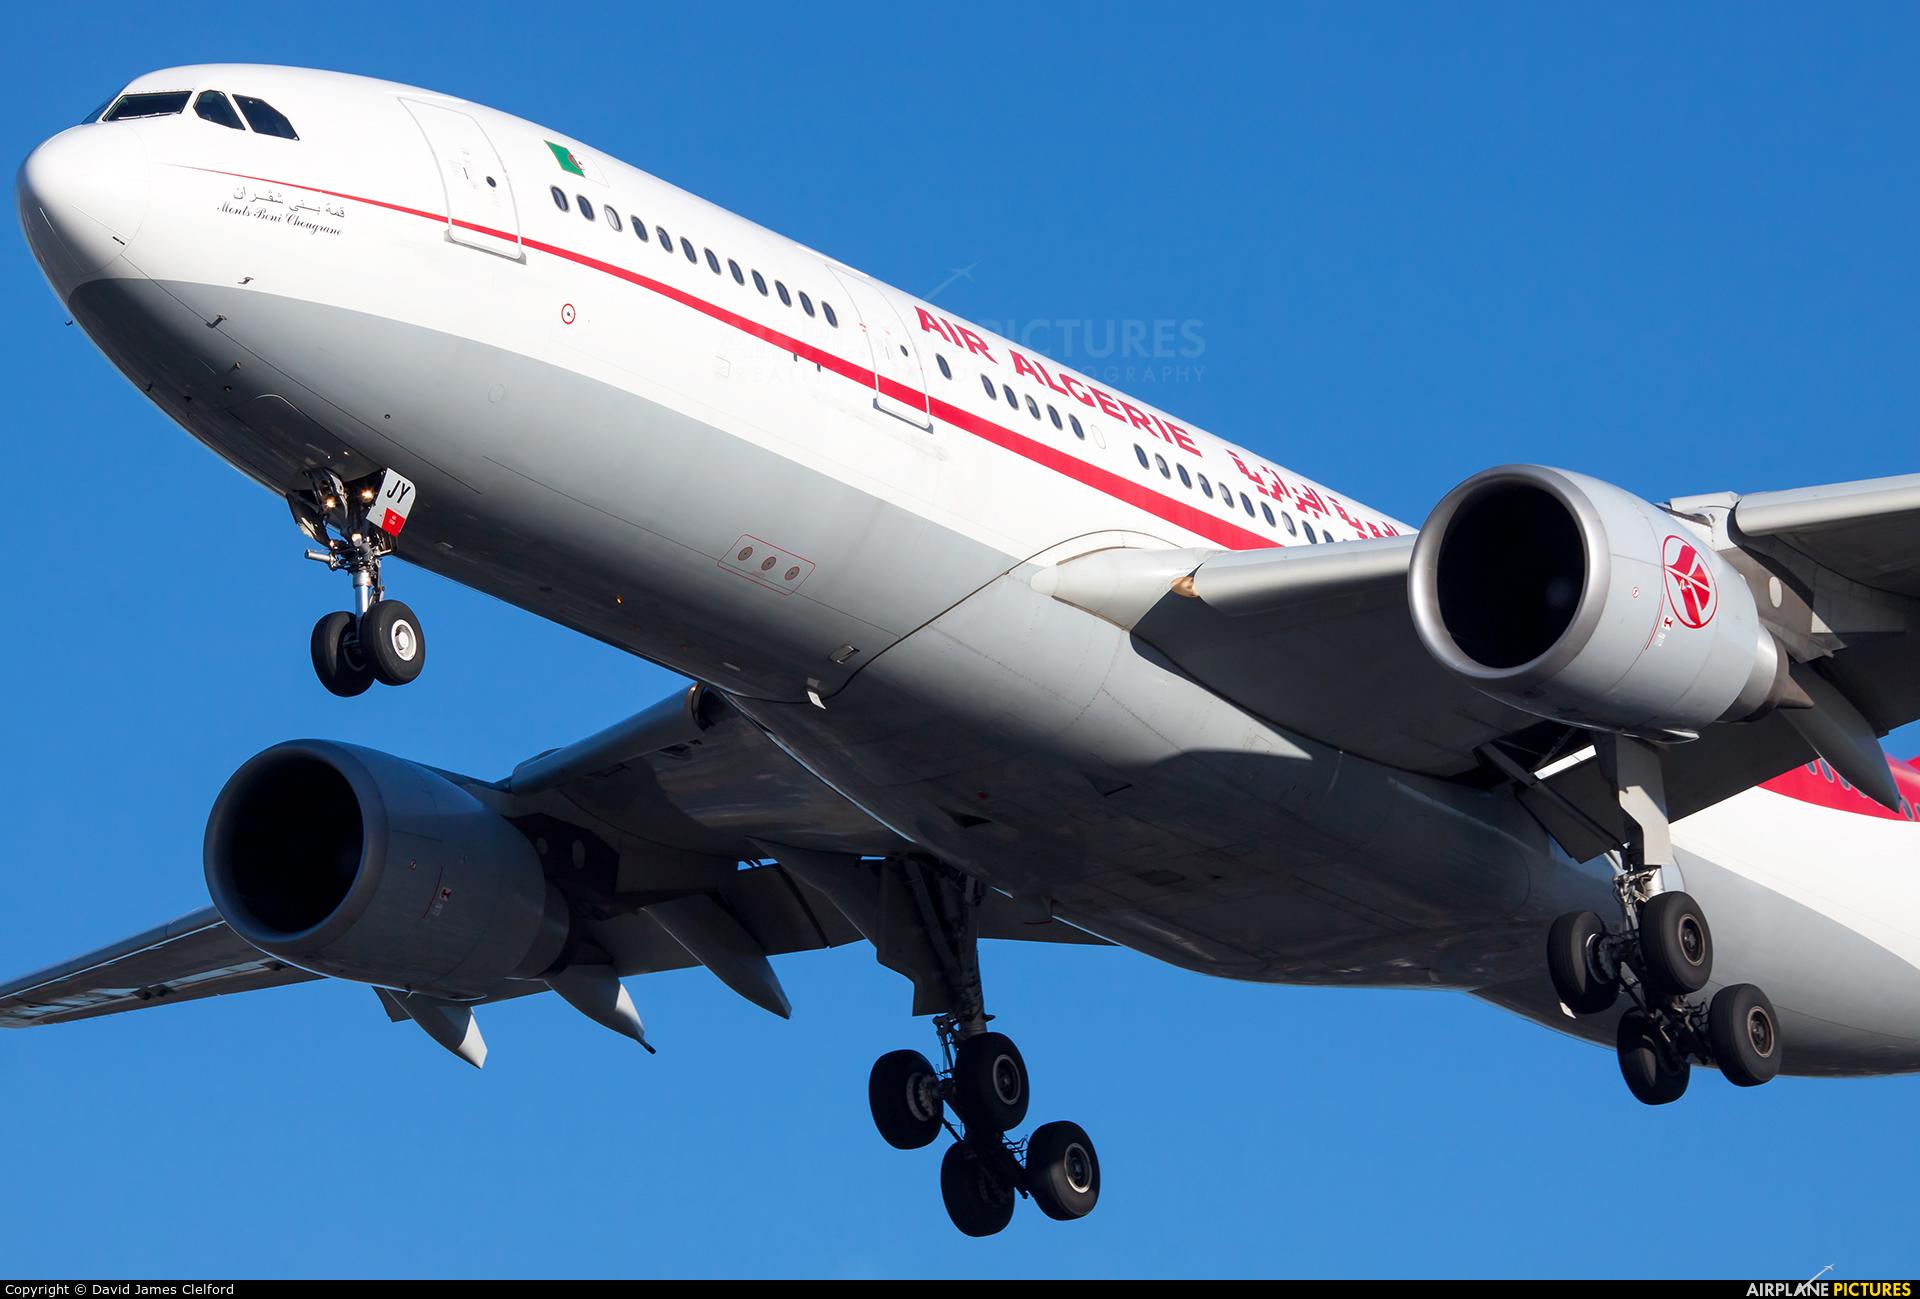 Air Algerie 7T-VJY aircraft at London - Heathrow